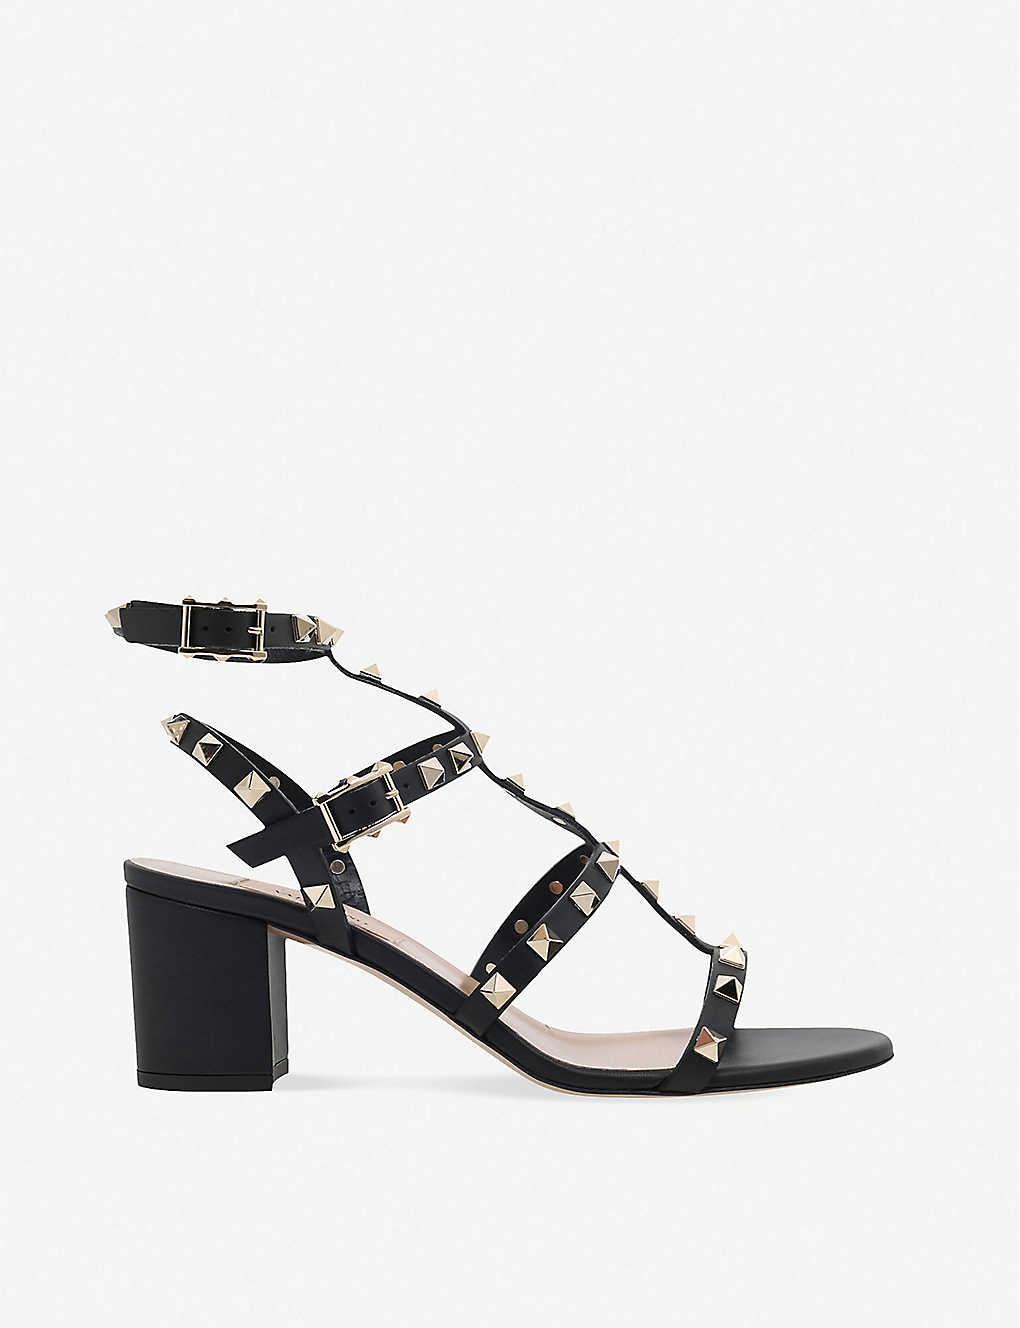 638595cc9dba VALENTINO - Garavani Rockstud 60 leather sandals